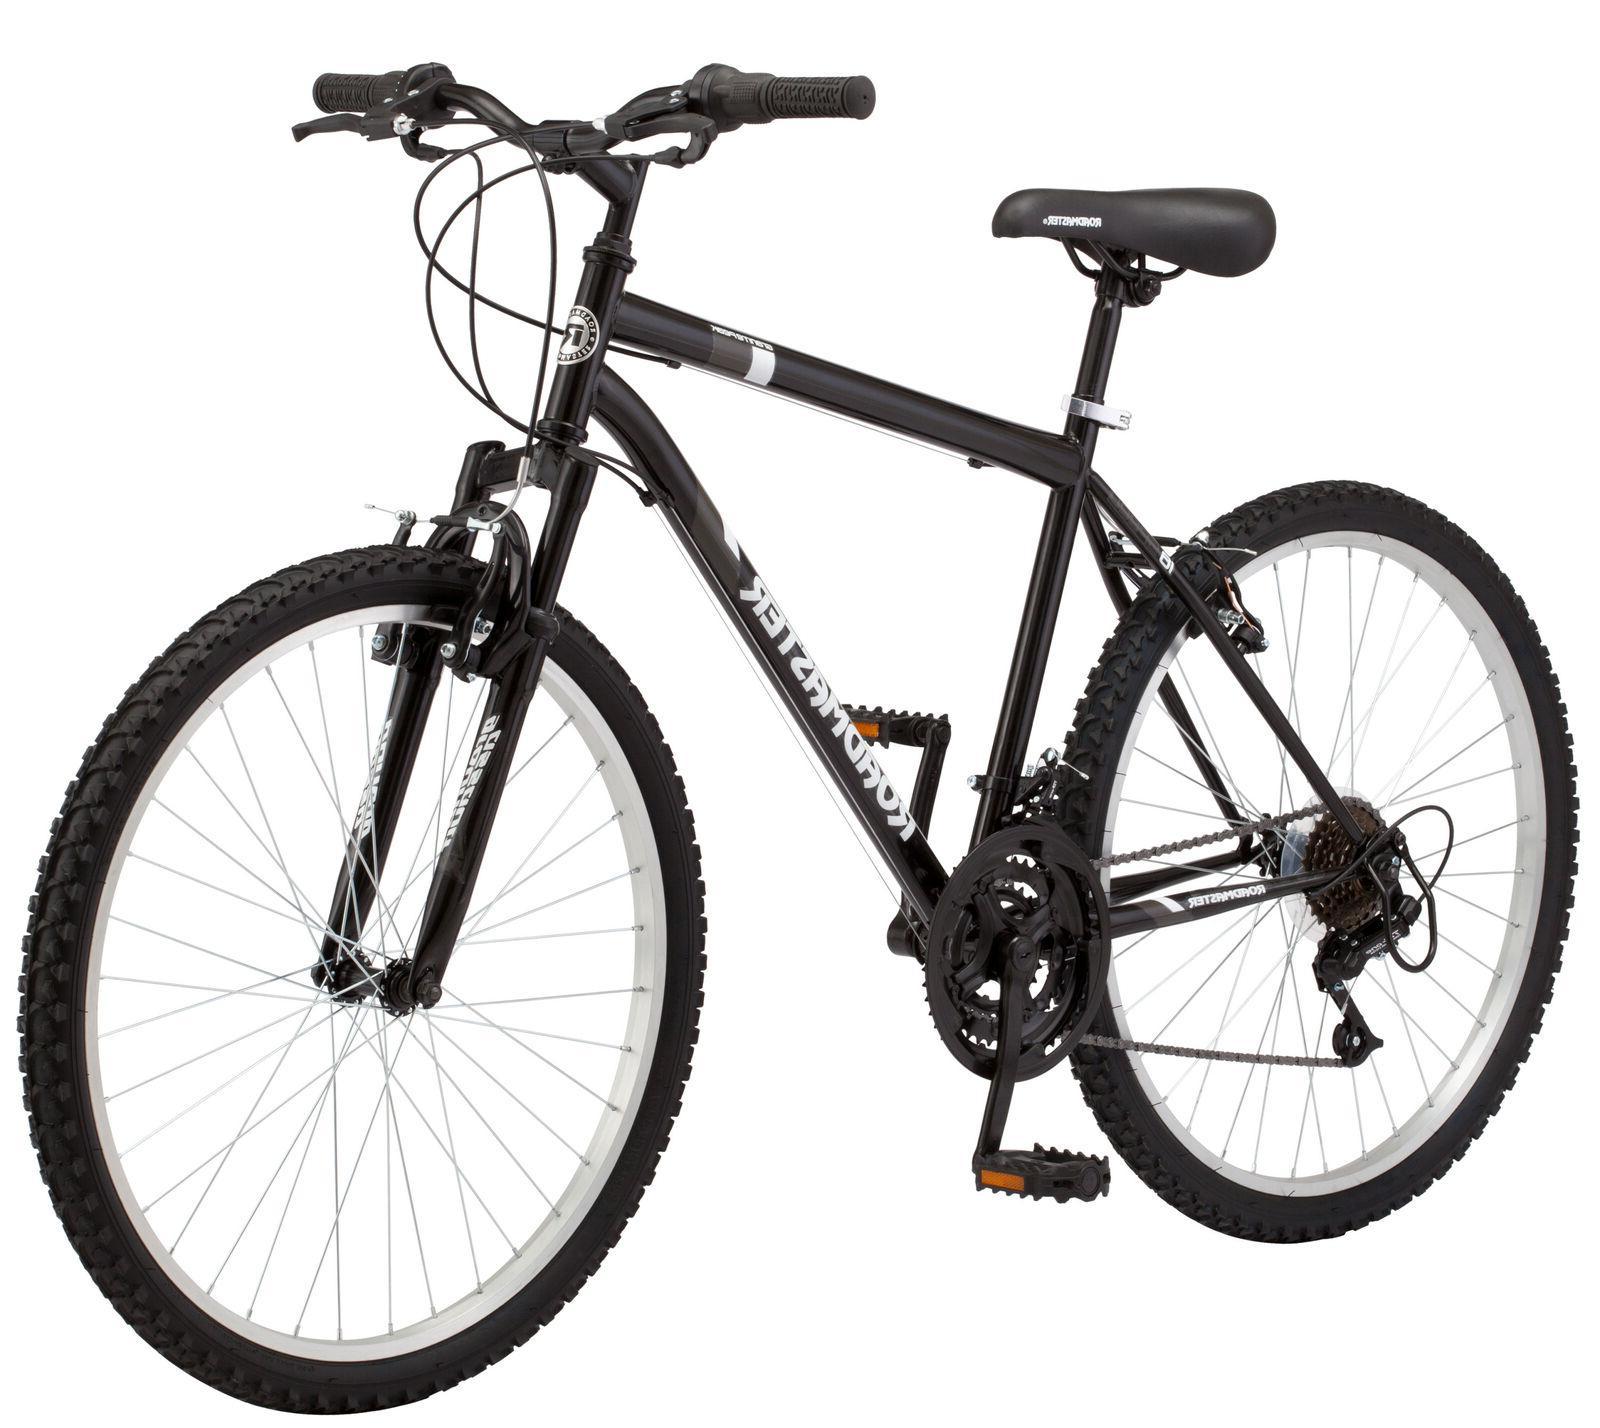 "Men's Mountain Bike 26"" Inches Roadmaster Granite Peak Bicyc"